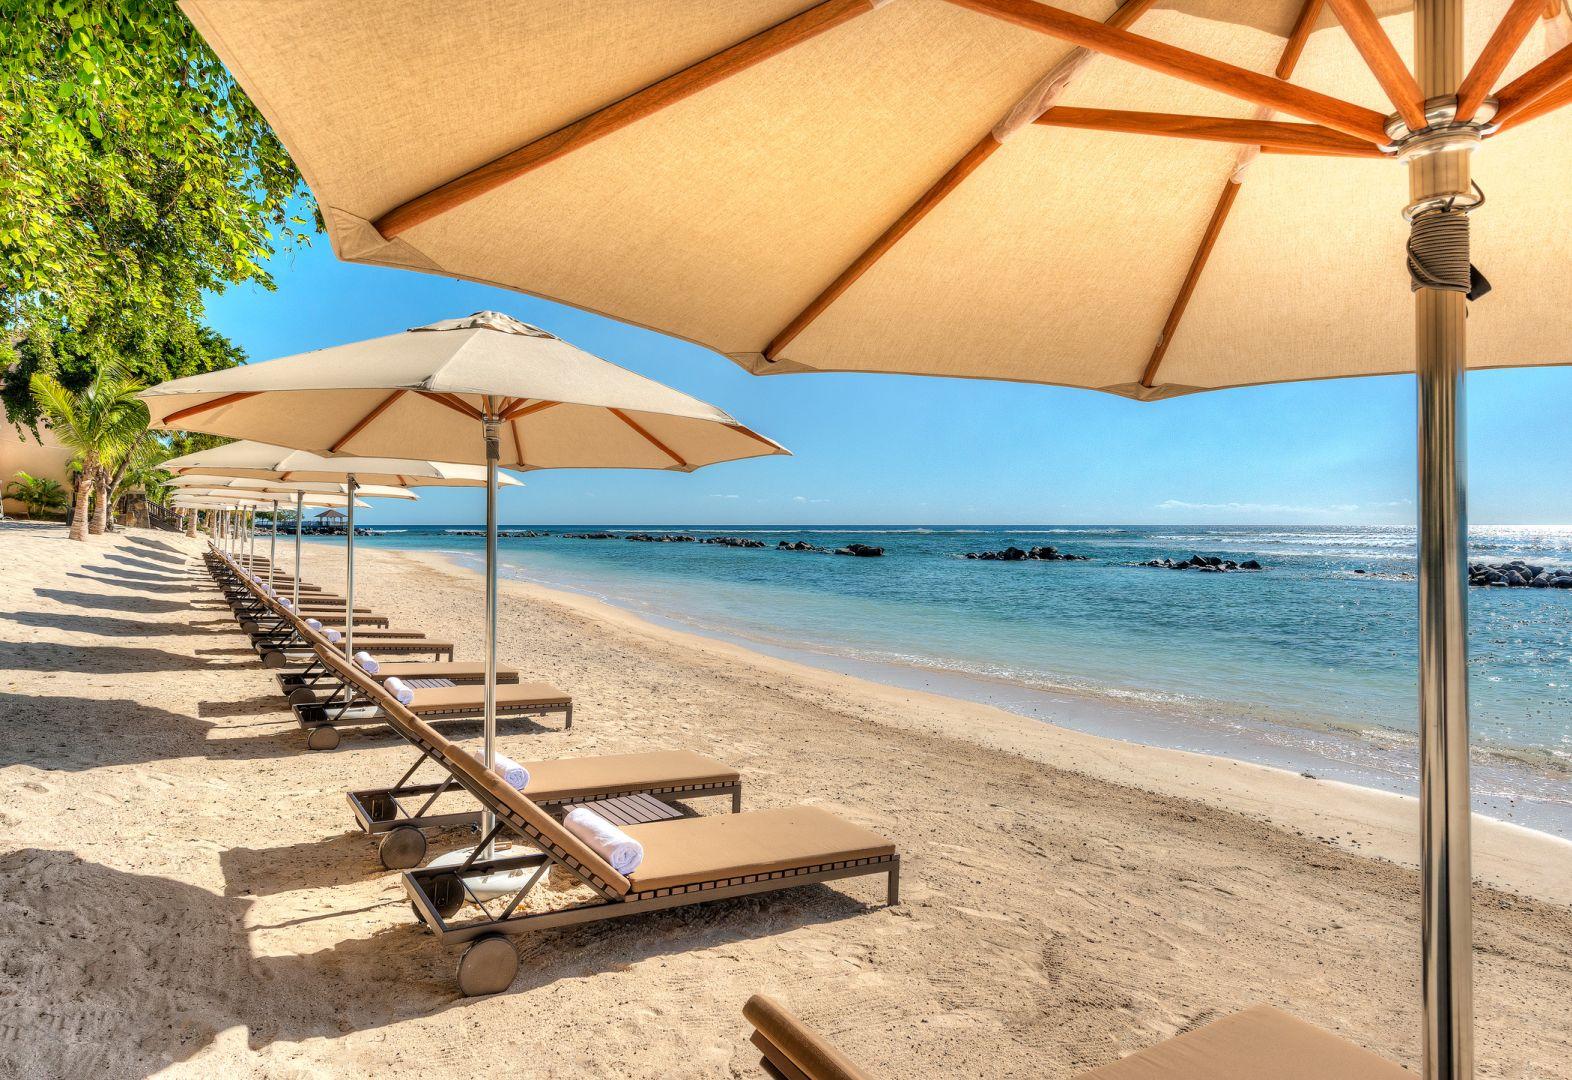 20The_Westin_Turtle_Bay_Resort_&_Spa_Mauritius_Det_Indiske_Ocean